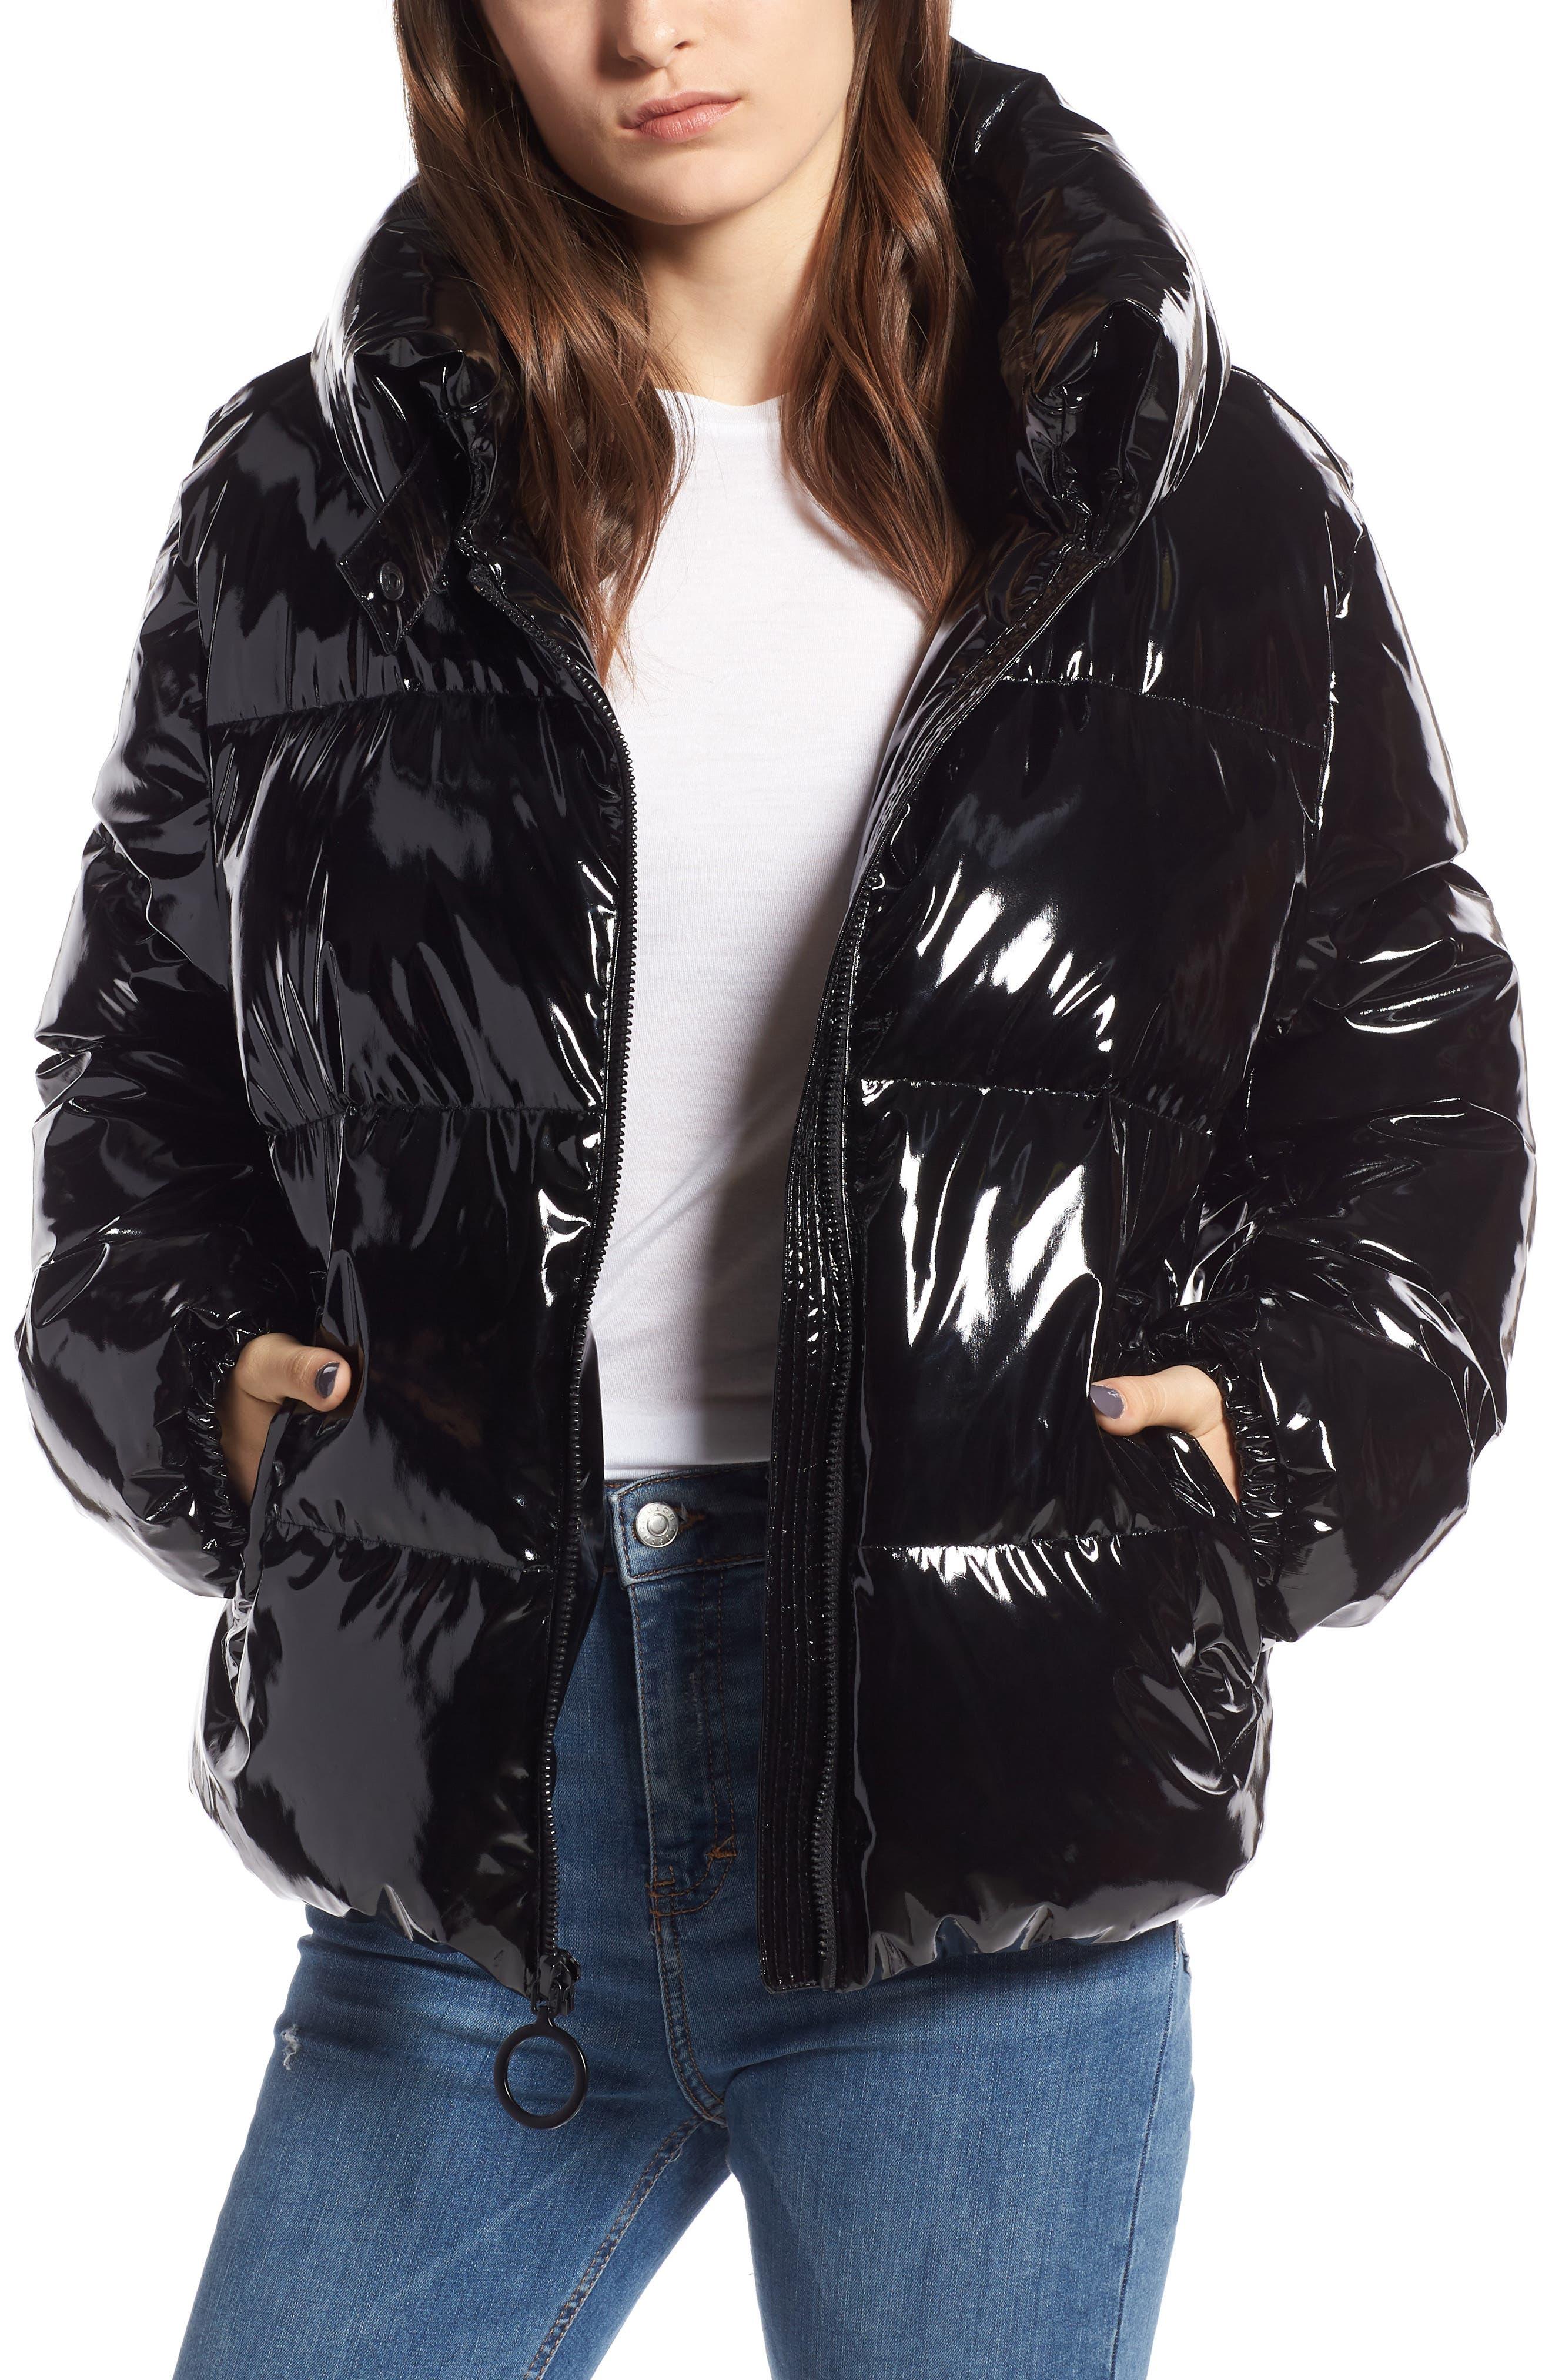 KENDALL + KYLIE, Vinyl Puffer Jacket, Main thumbnail 1, color, BLACK